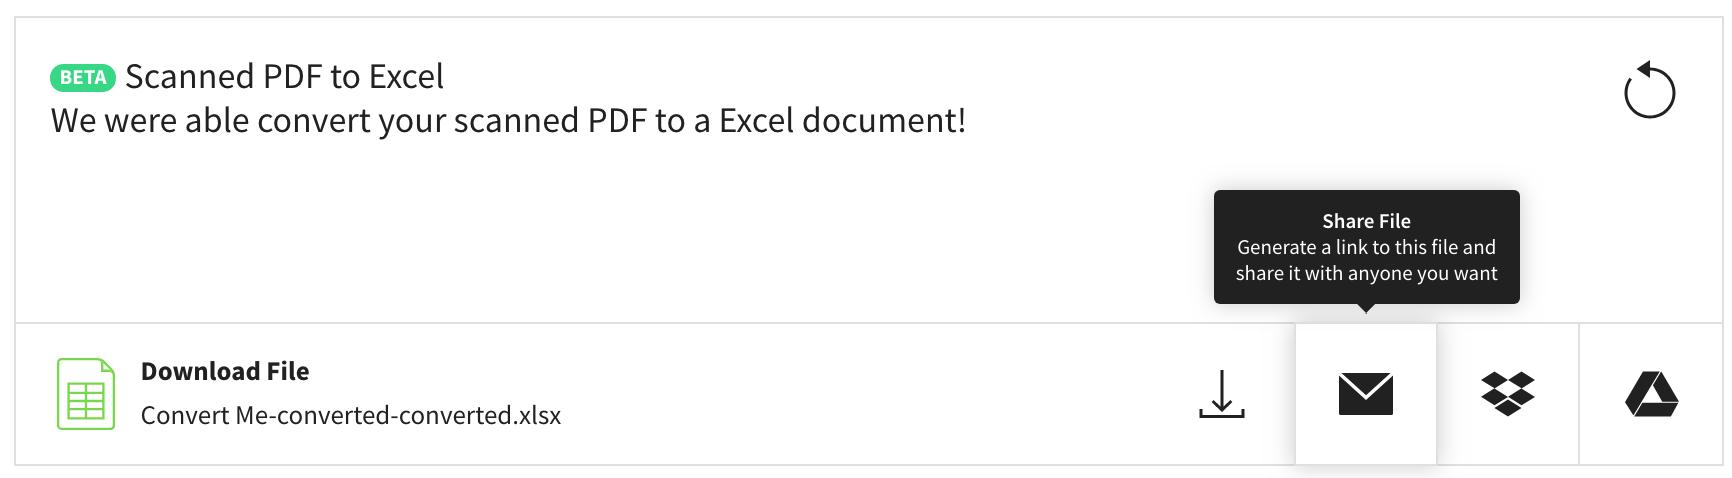 Convert JPG to Excel